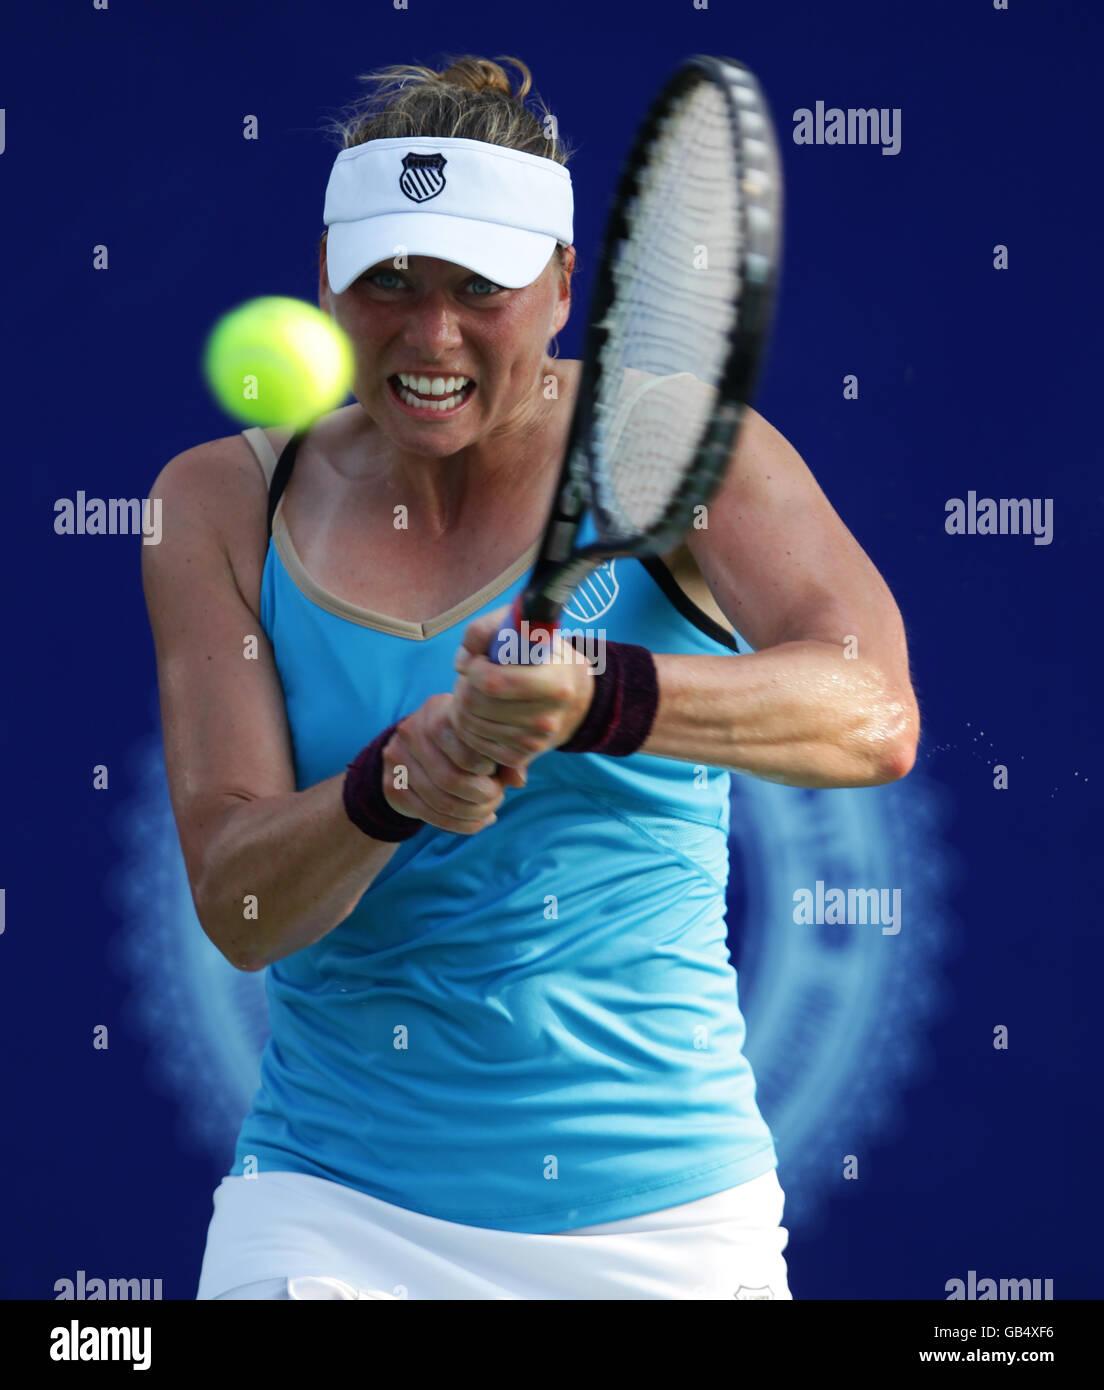 La joueuse de tennis russe Vera Zvonareva, PTT Pattaya Open 2011 Tournoi de Tennis, WTA, International Series, Dusit Resort, Pattaya Banque D'Images